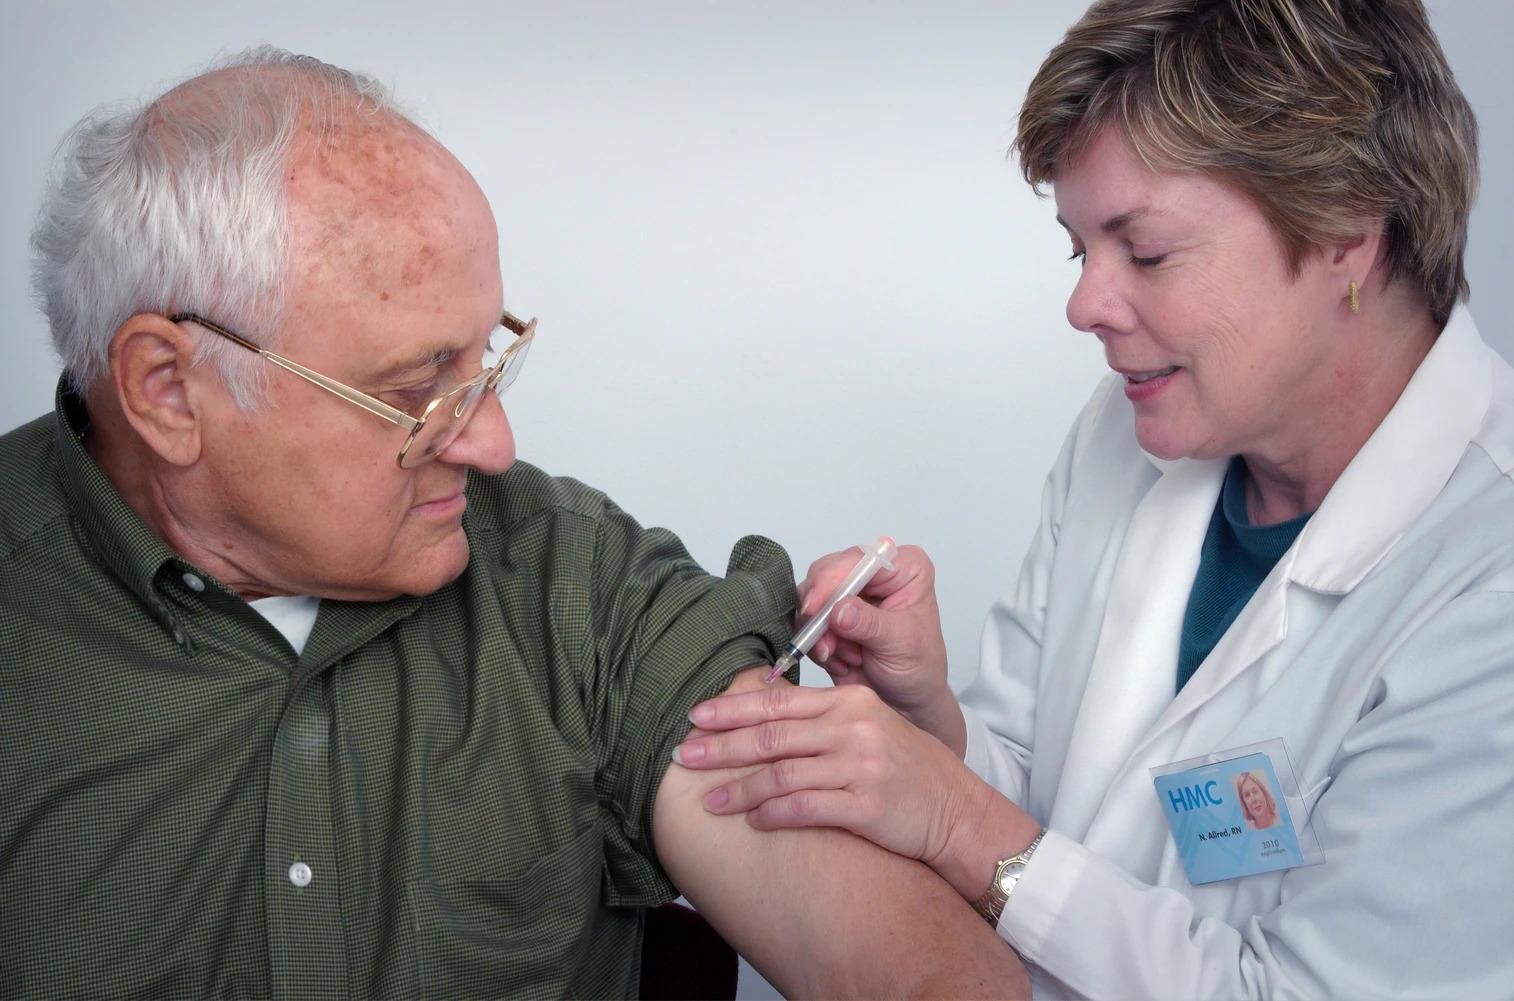 corona: corona vaccine / vaccine update / disease